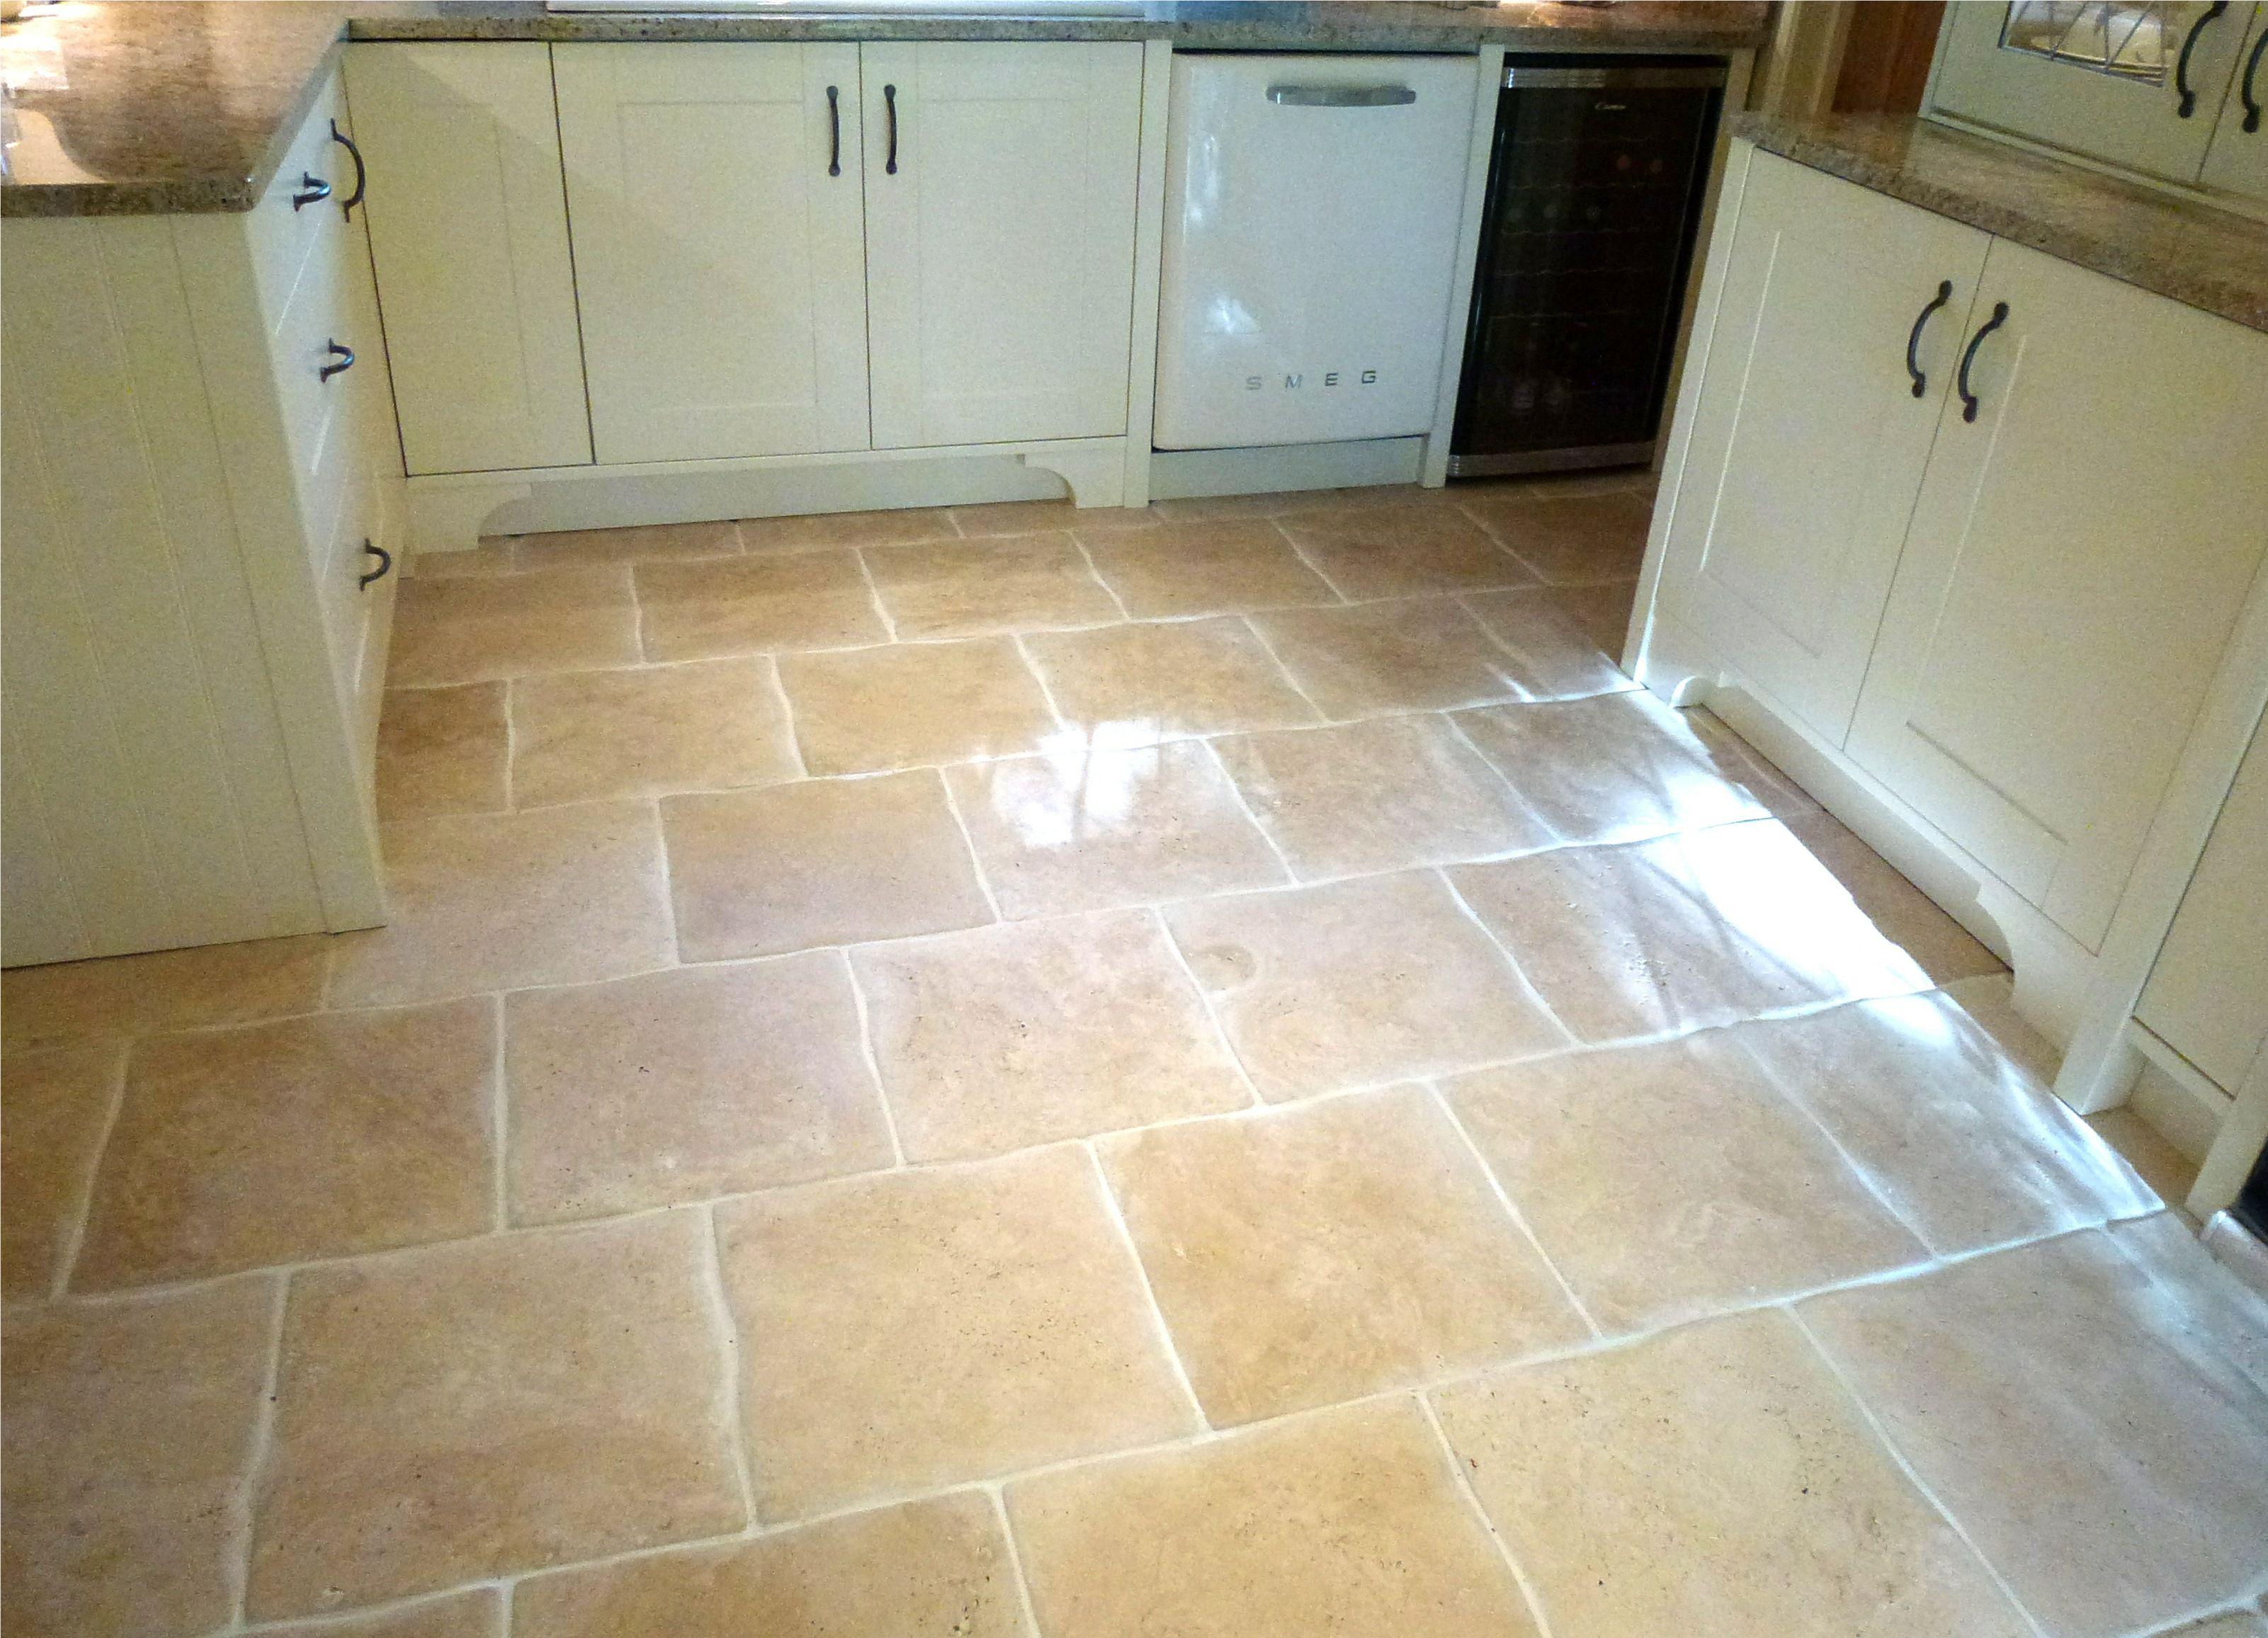 The color of tile Wavy edge travertine kitchen floor tiles